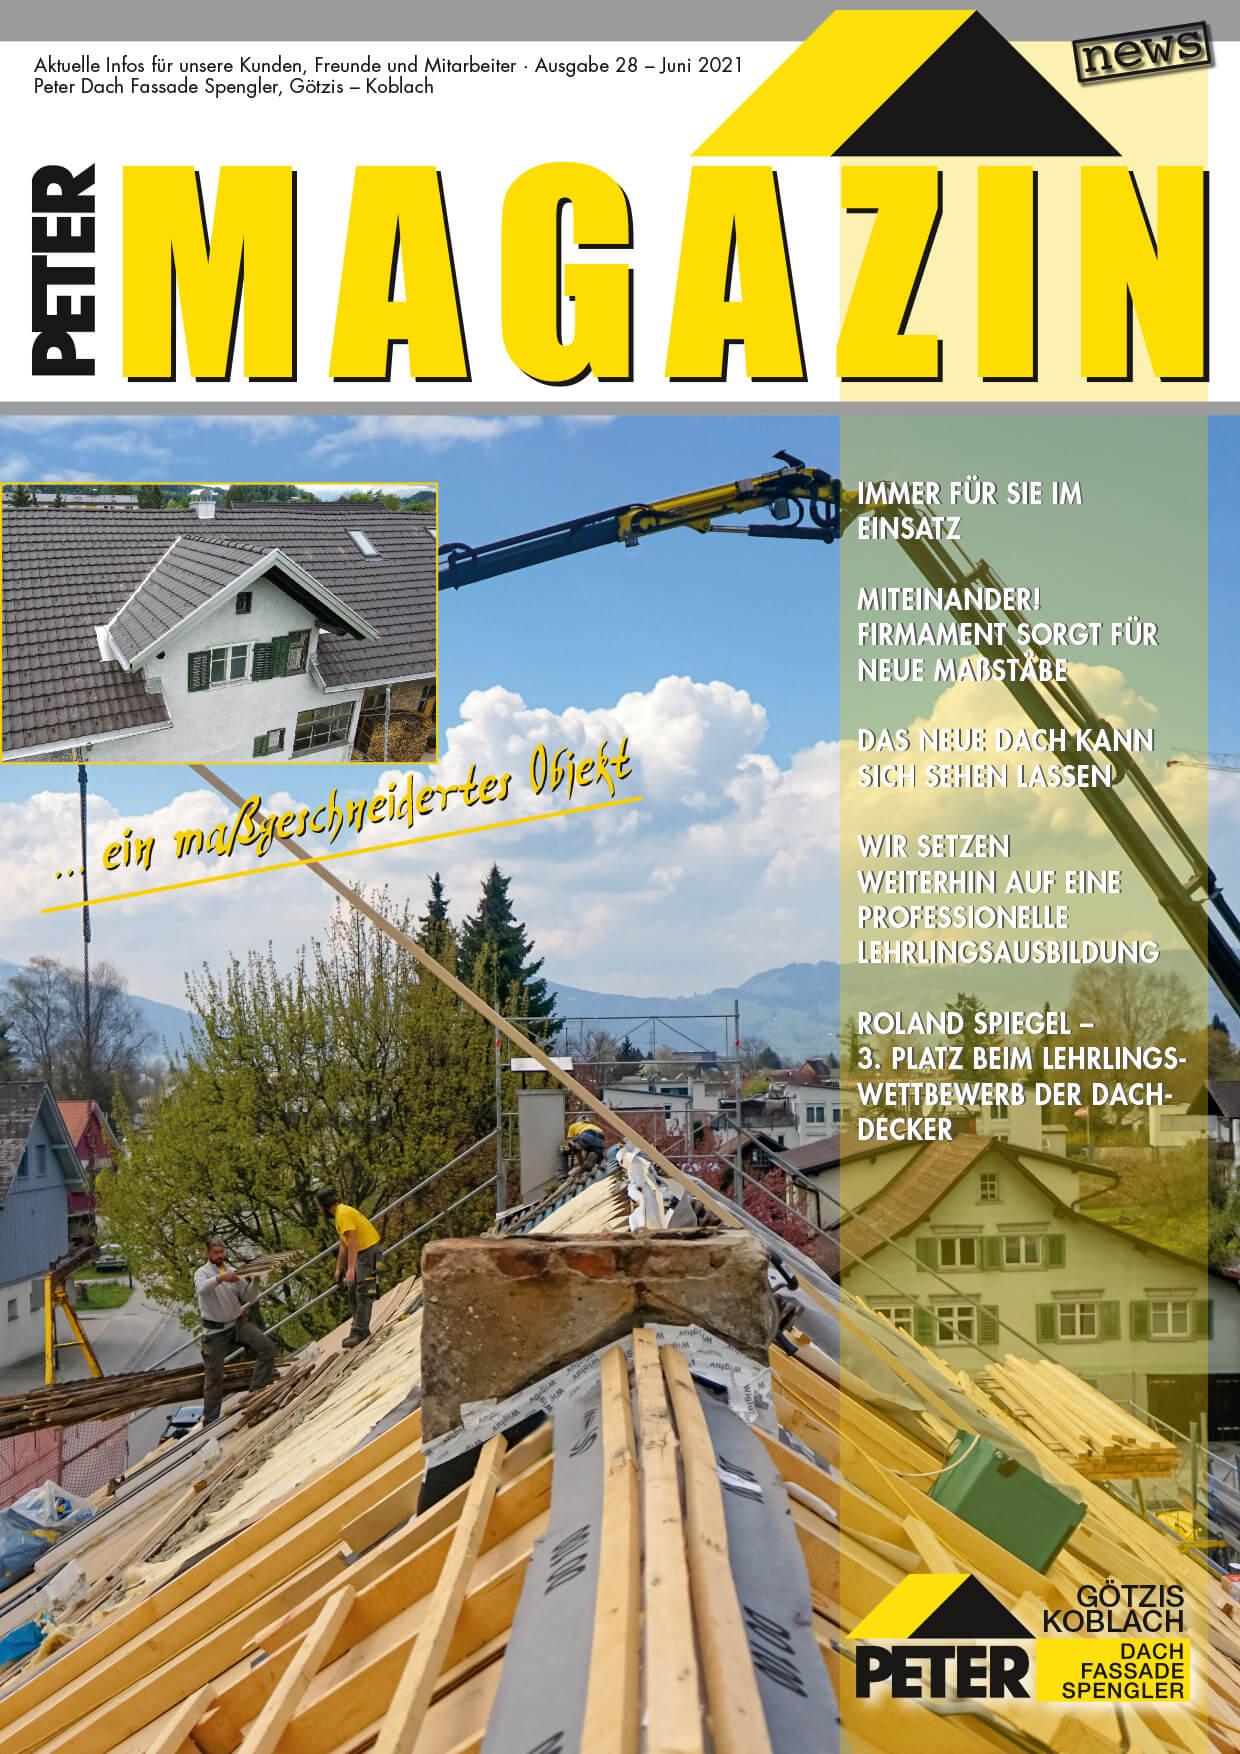 Peter-Dach-Spenglerei-Vorarlberg-Magazin-Juni-2021